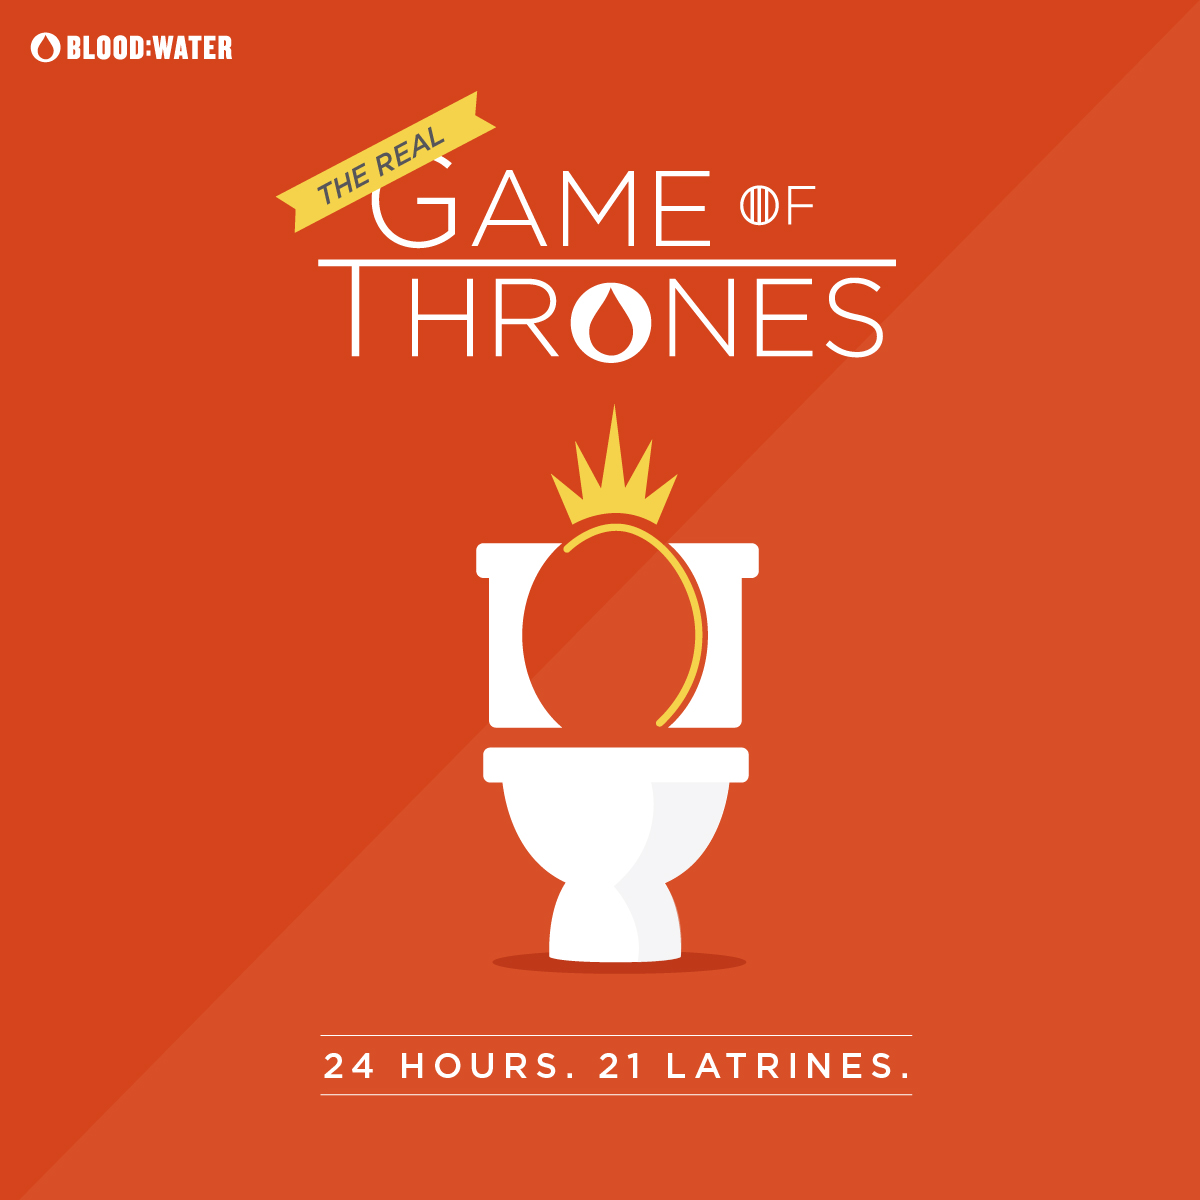 GameOfThrones_shares-01-copy.jpg